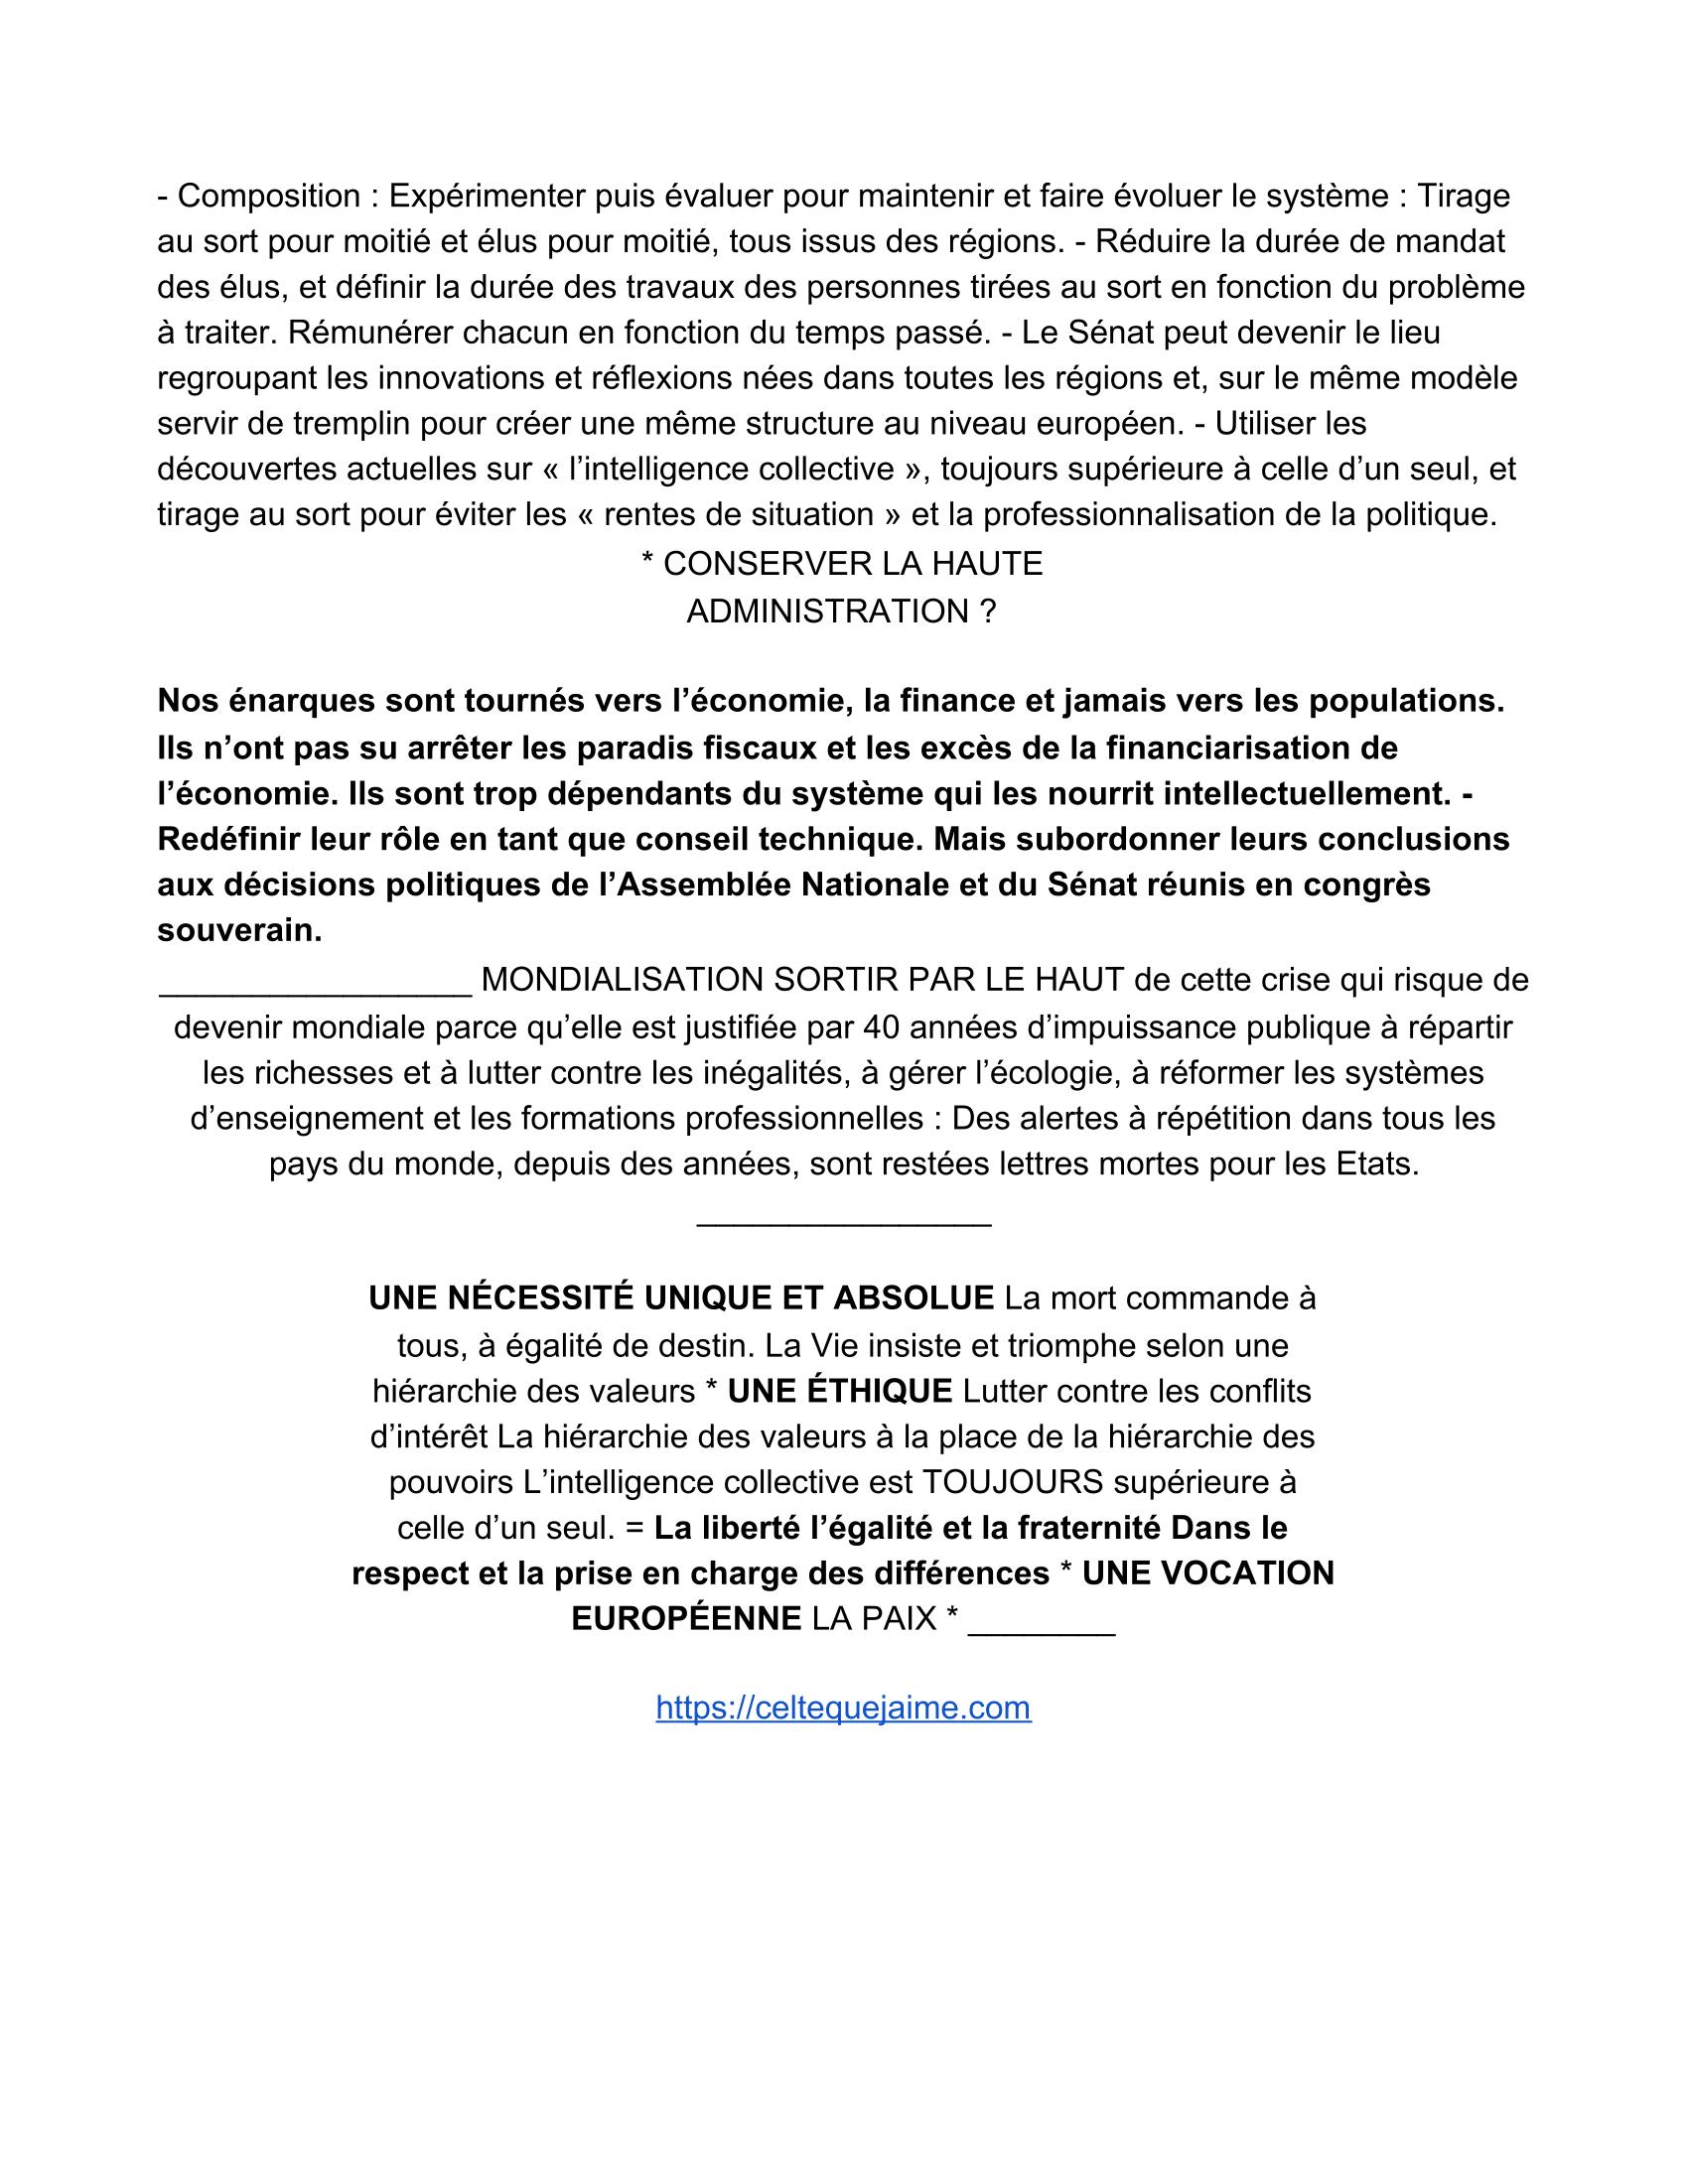 Microsoft Word - GJ(CT)_E.Macron.doc-3.png